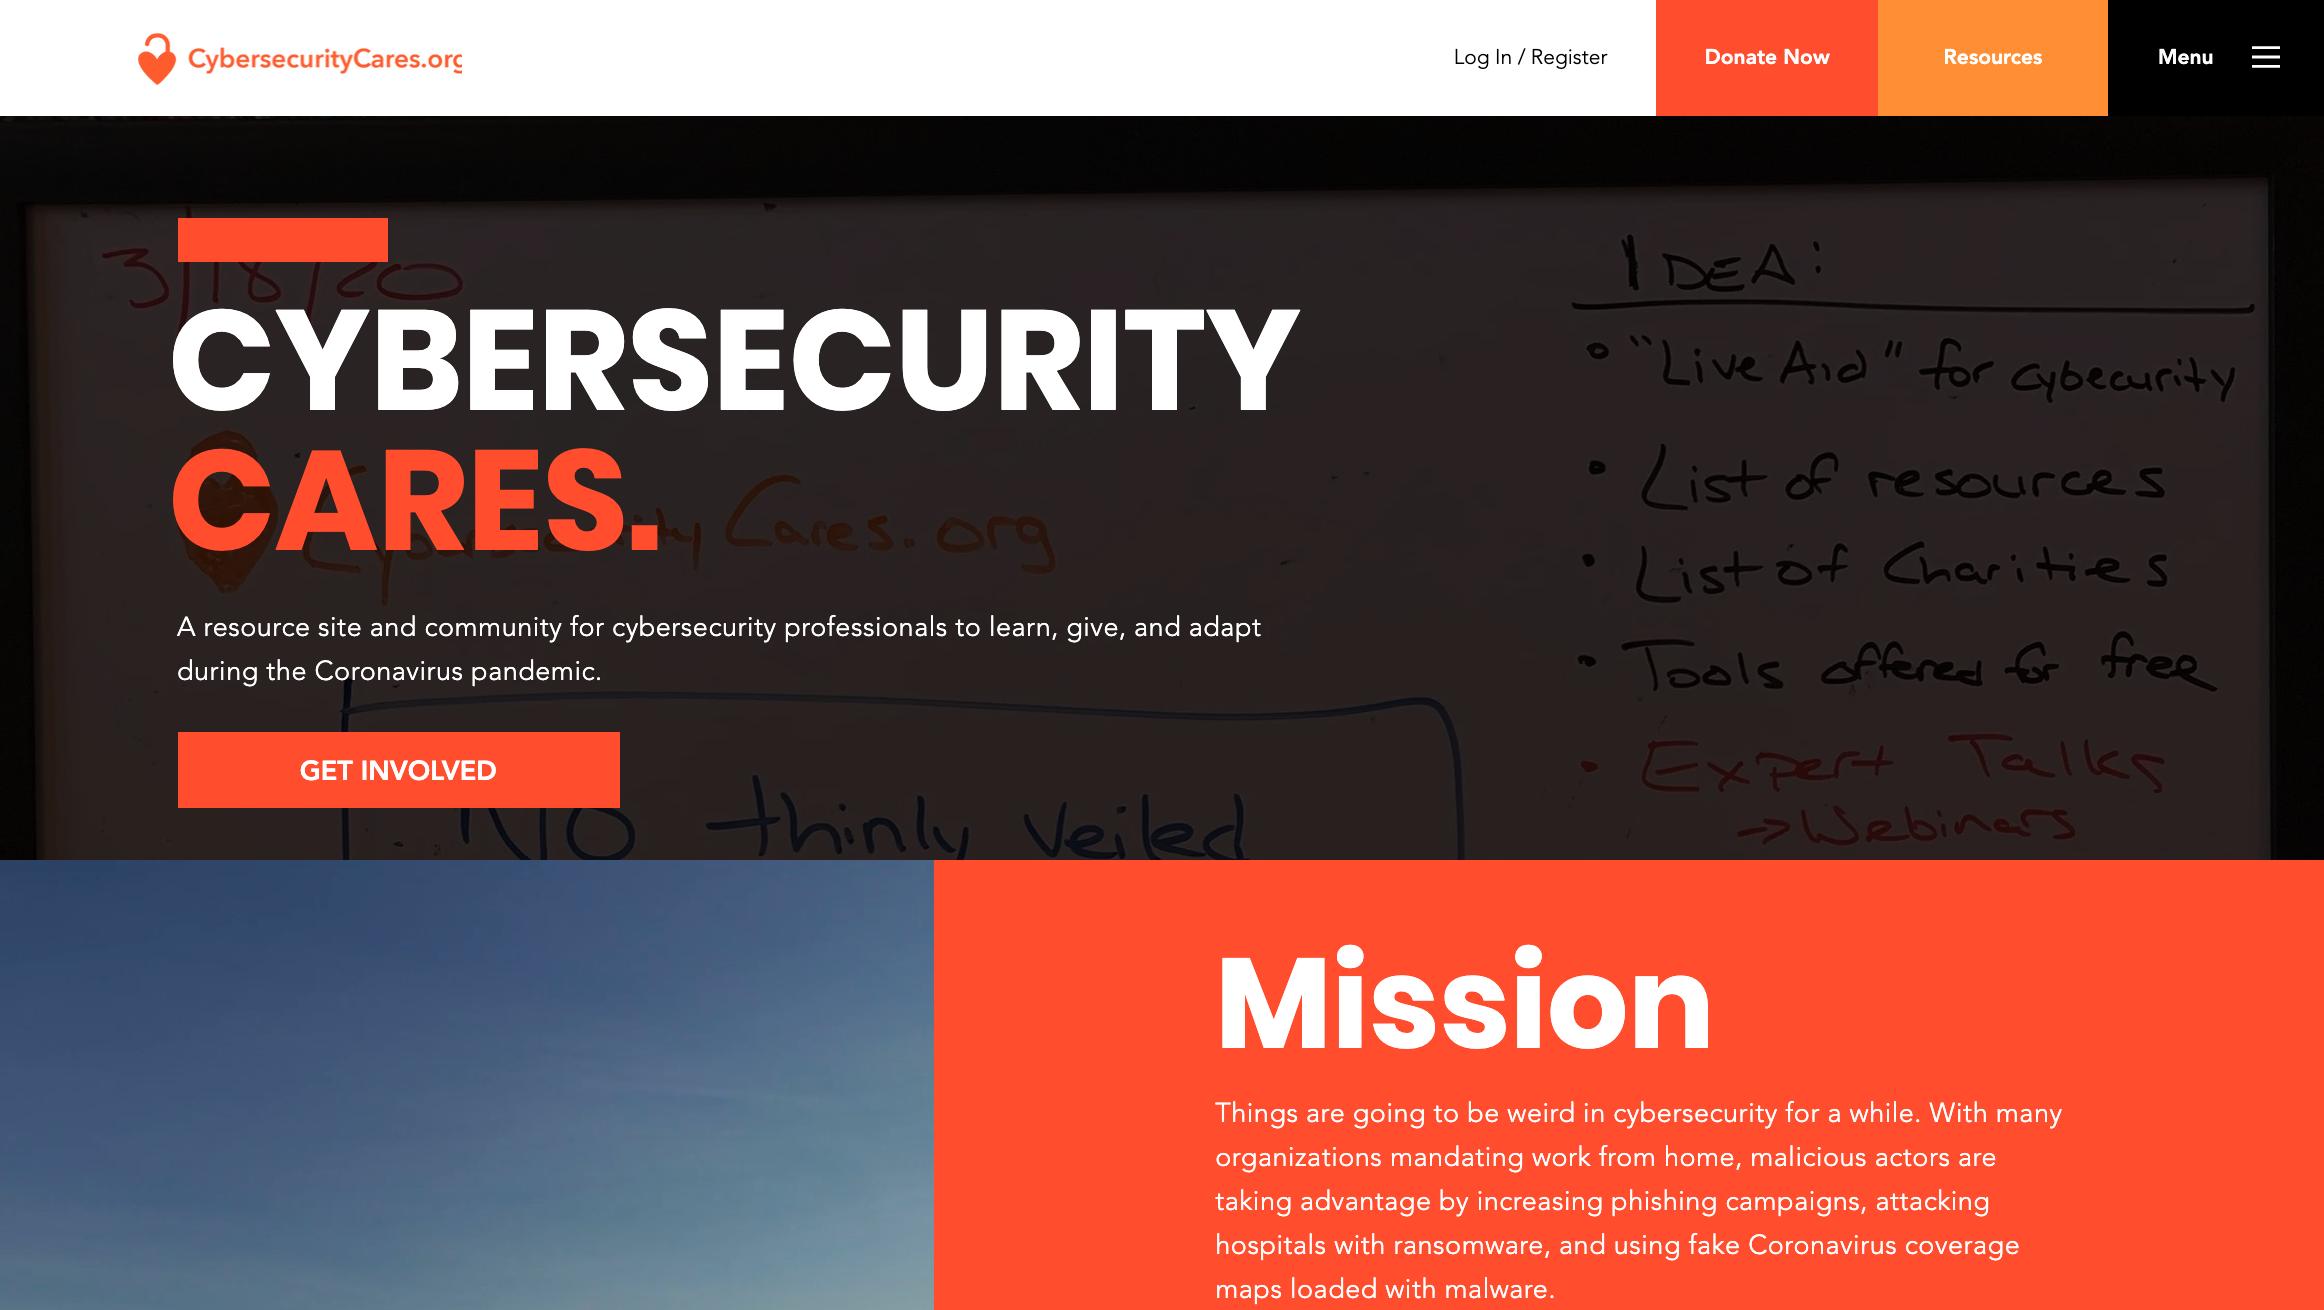 Cybersecurity Cares Website